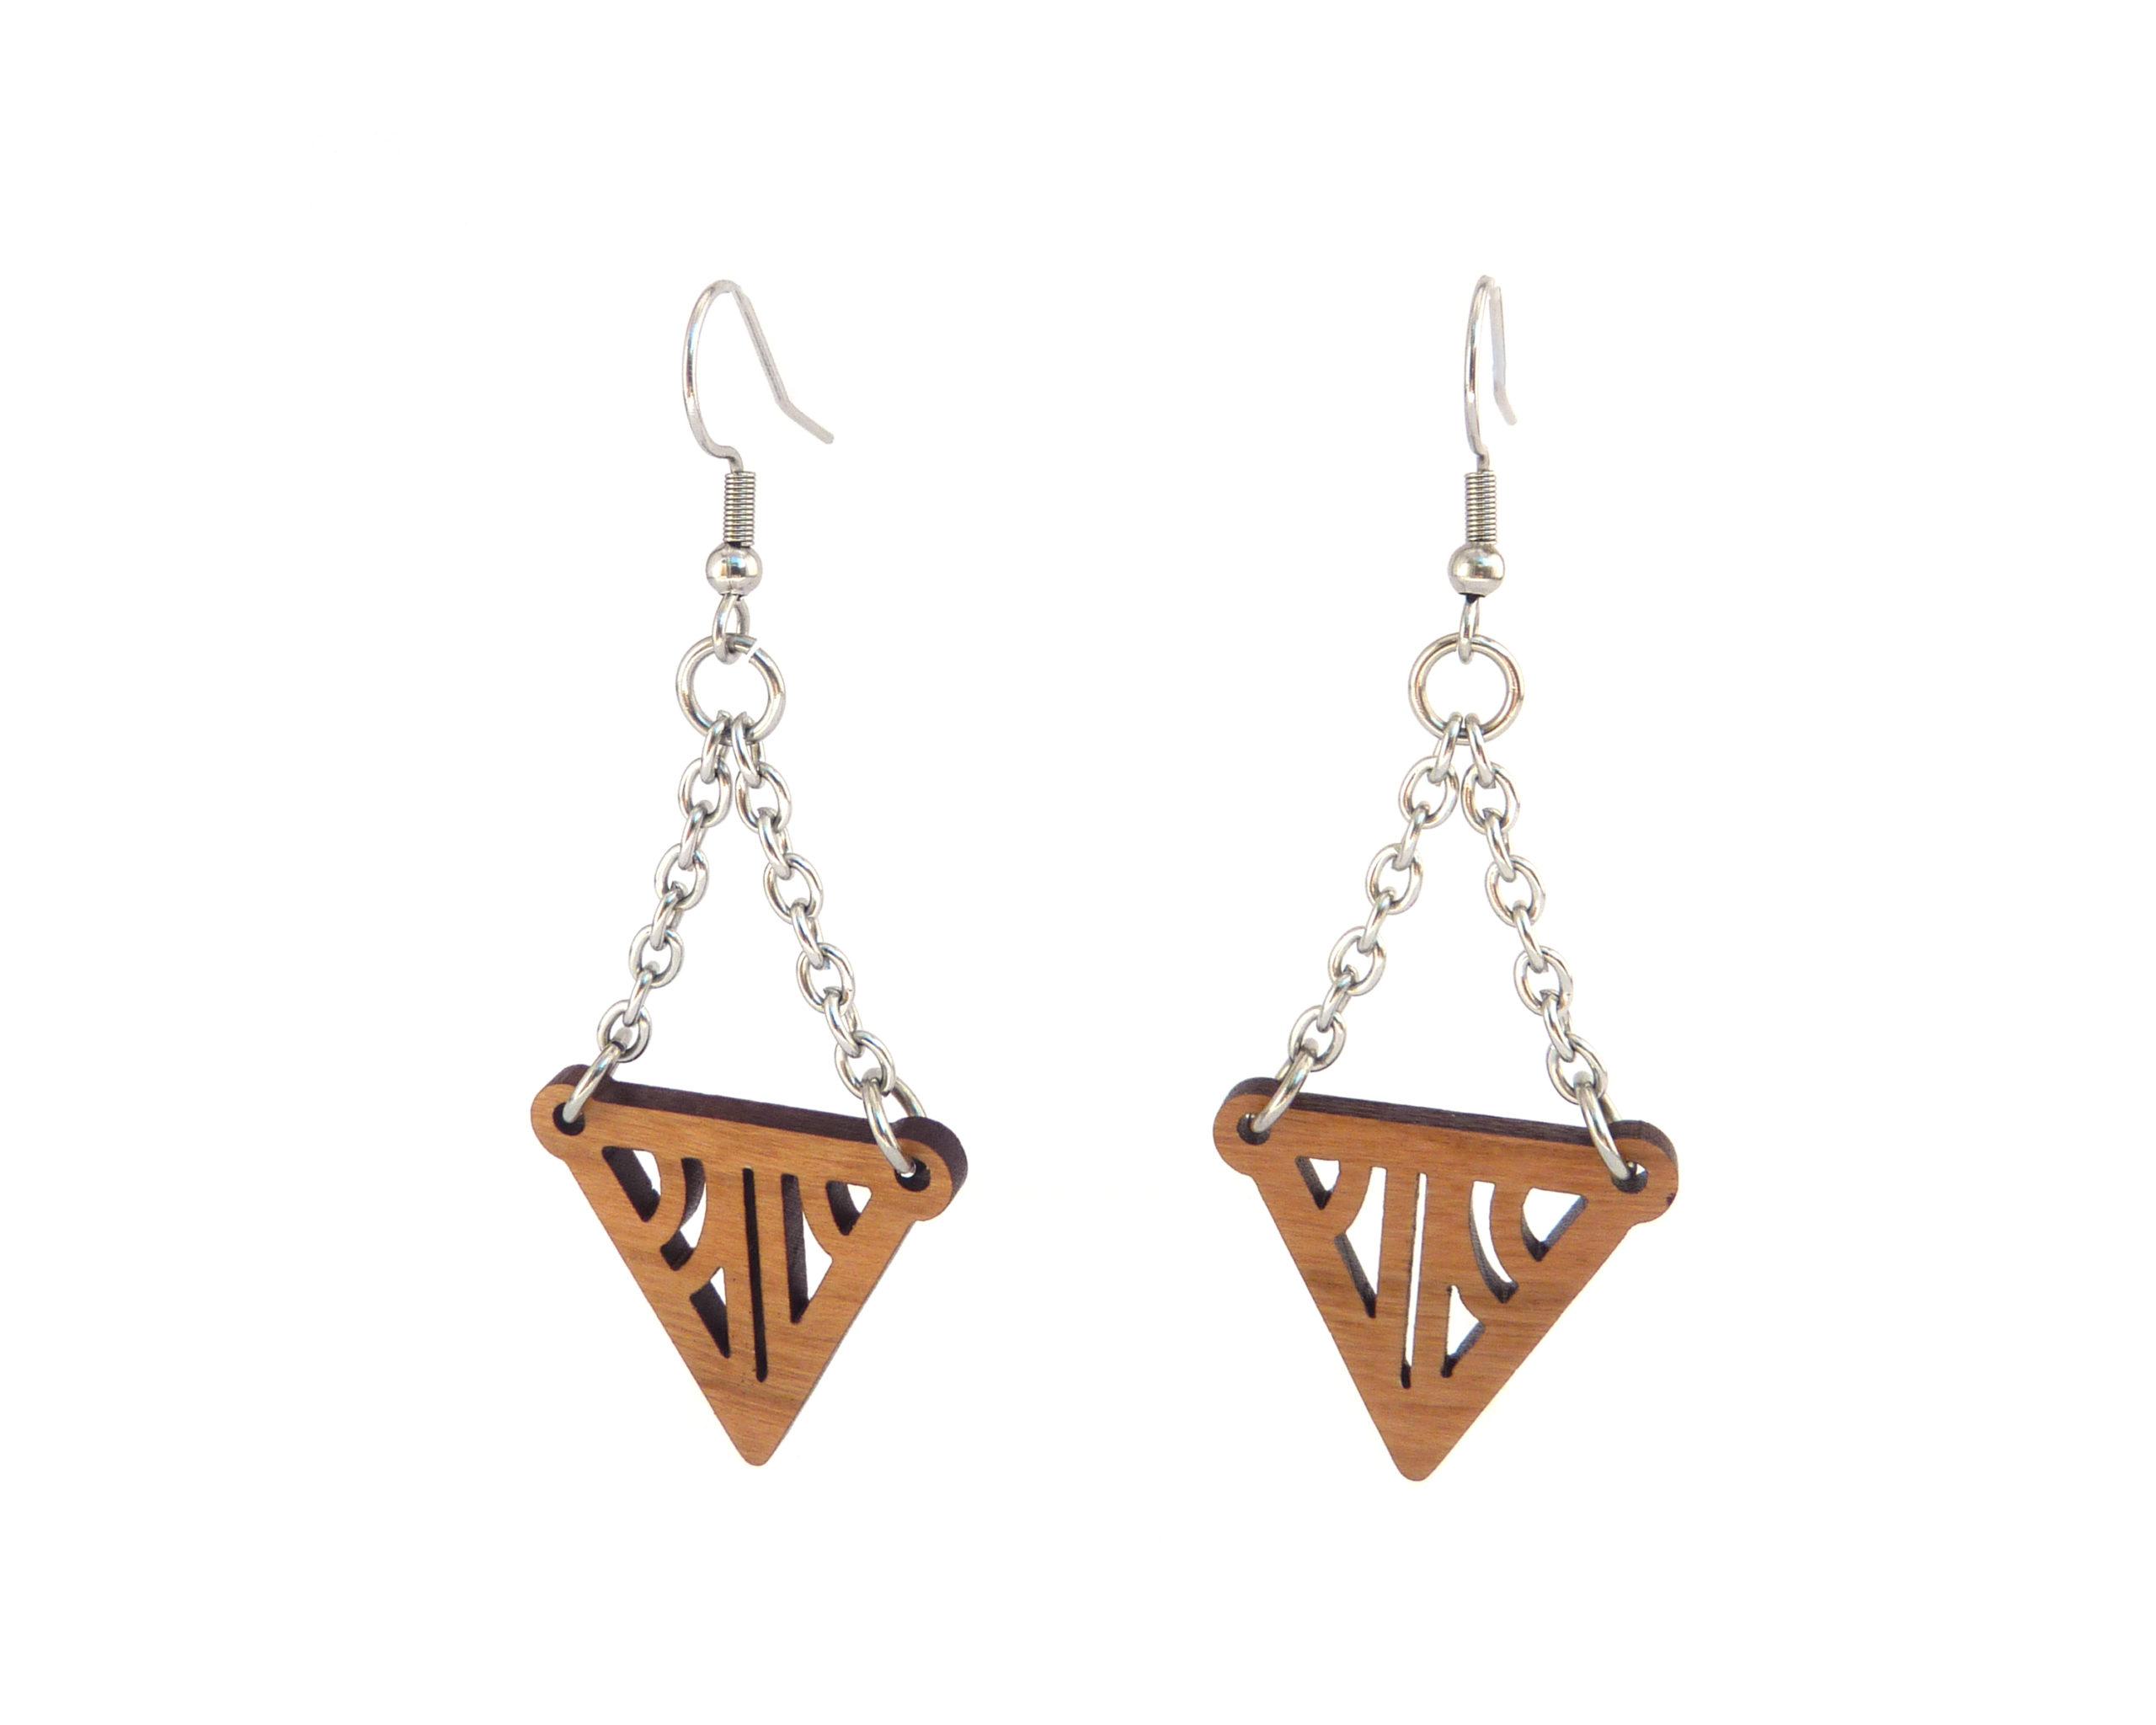 Geometric Triangles Chain Drop Wood Earrings - Choose Wood